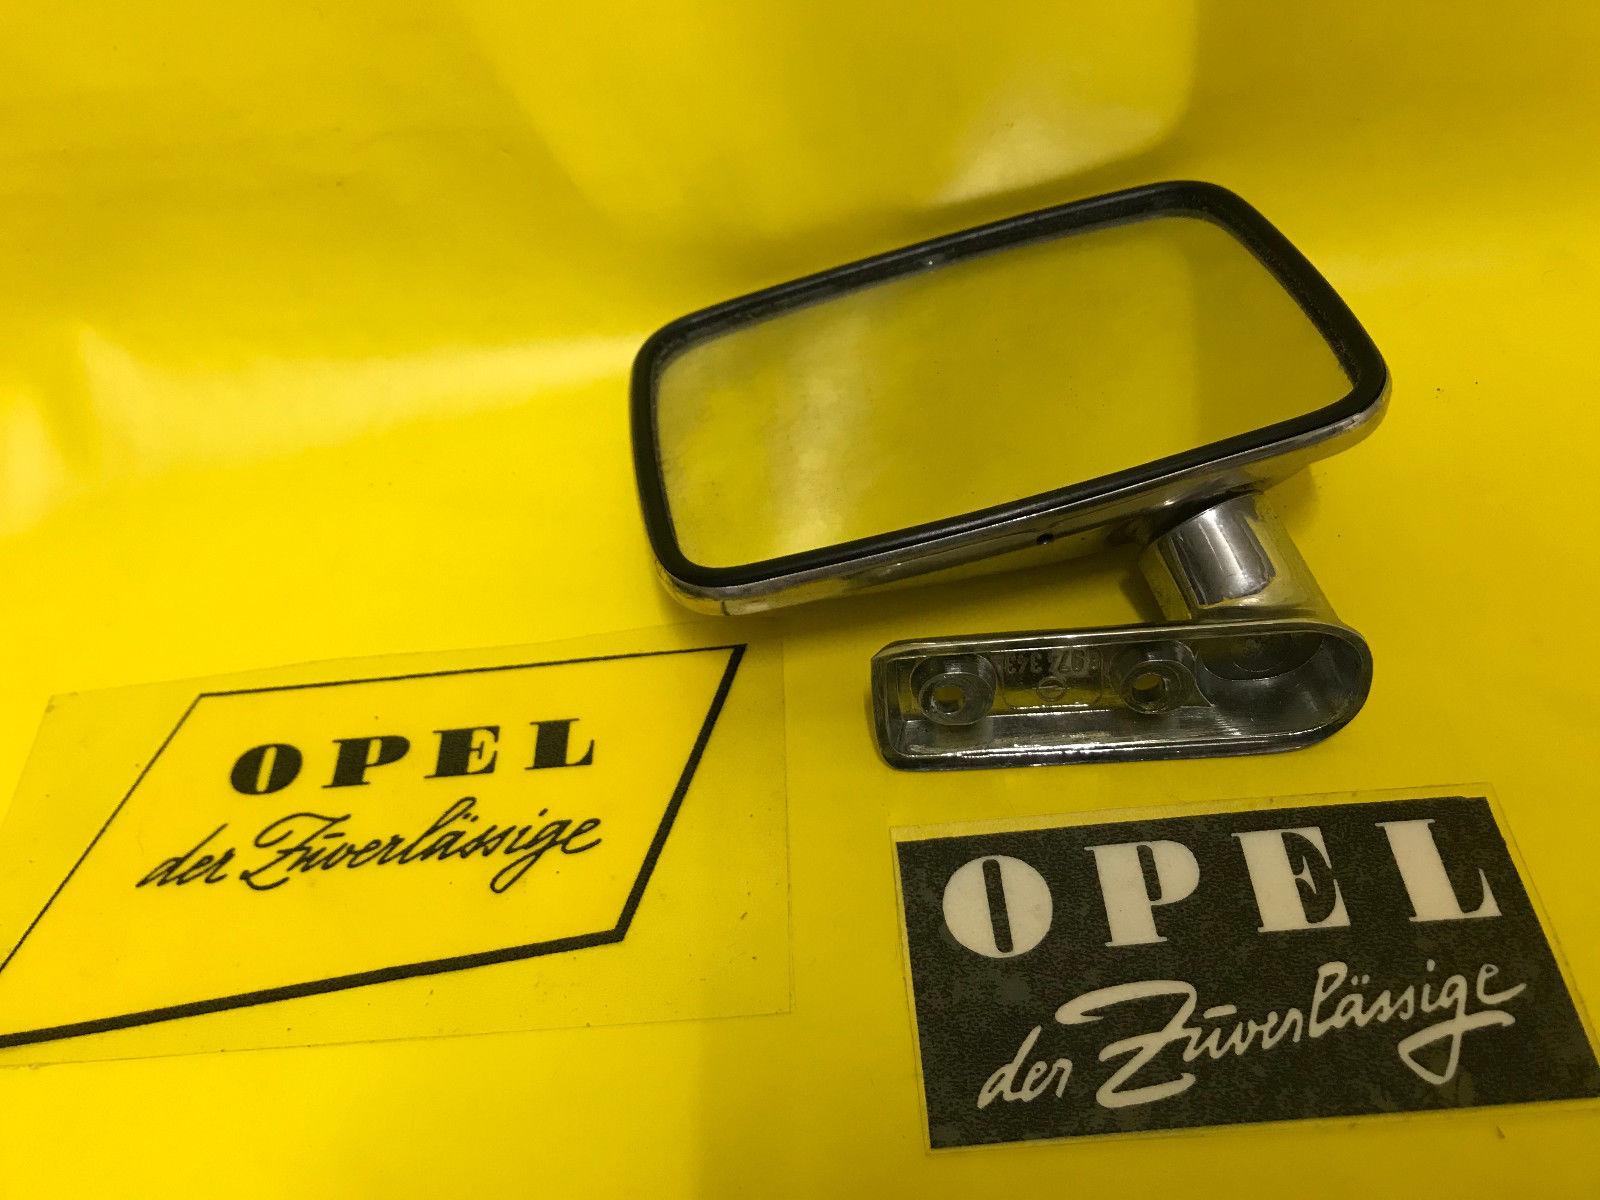 Kofferraumdichtung für Opel Kadett C Limo//Aero//Coupe